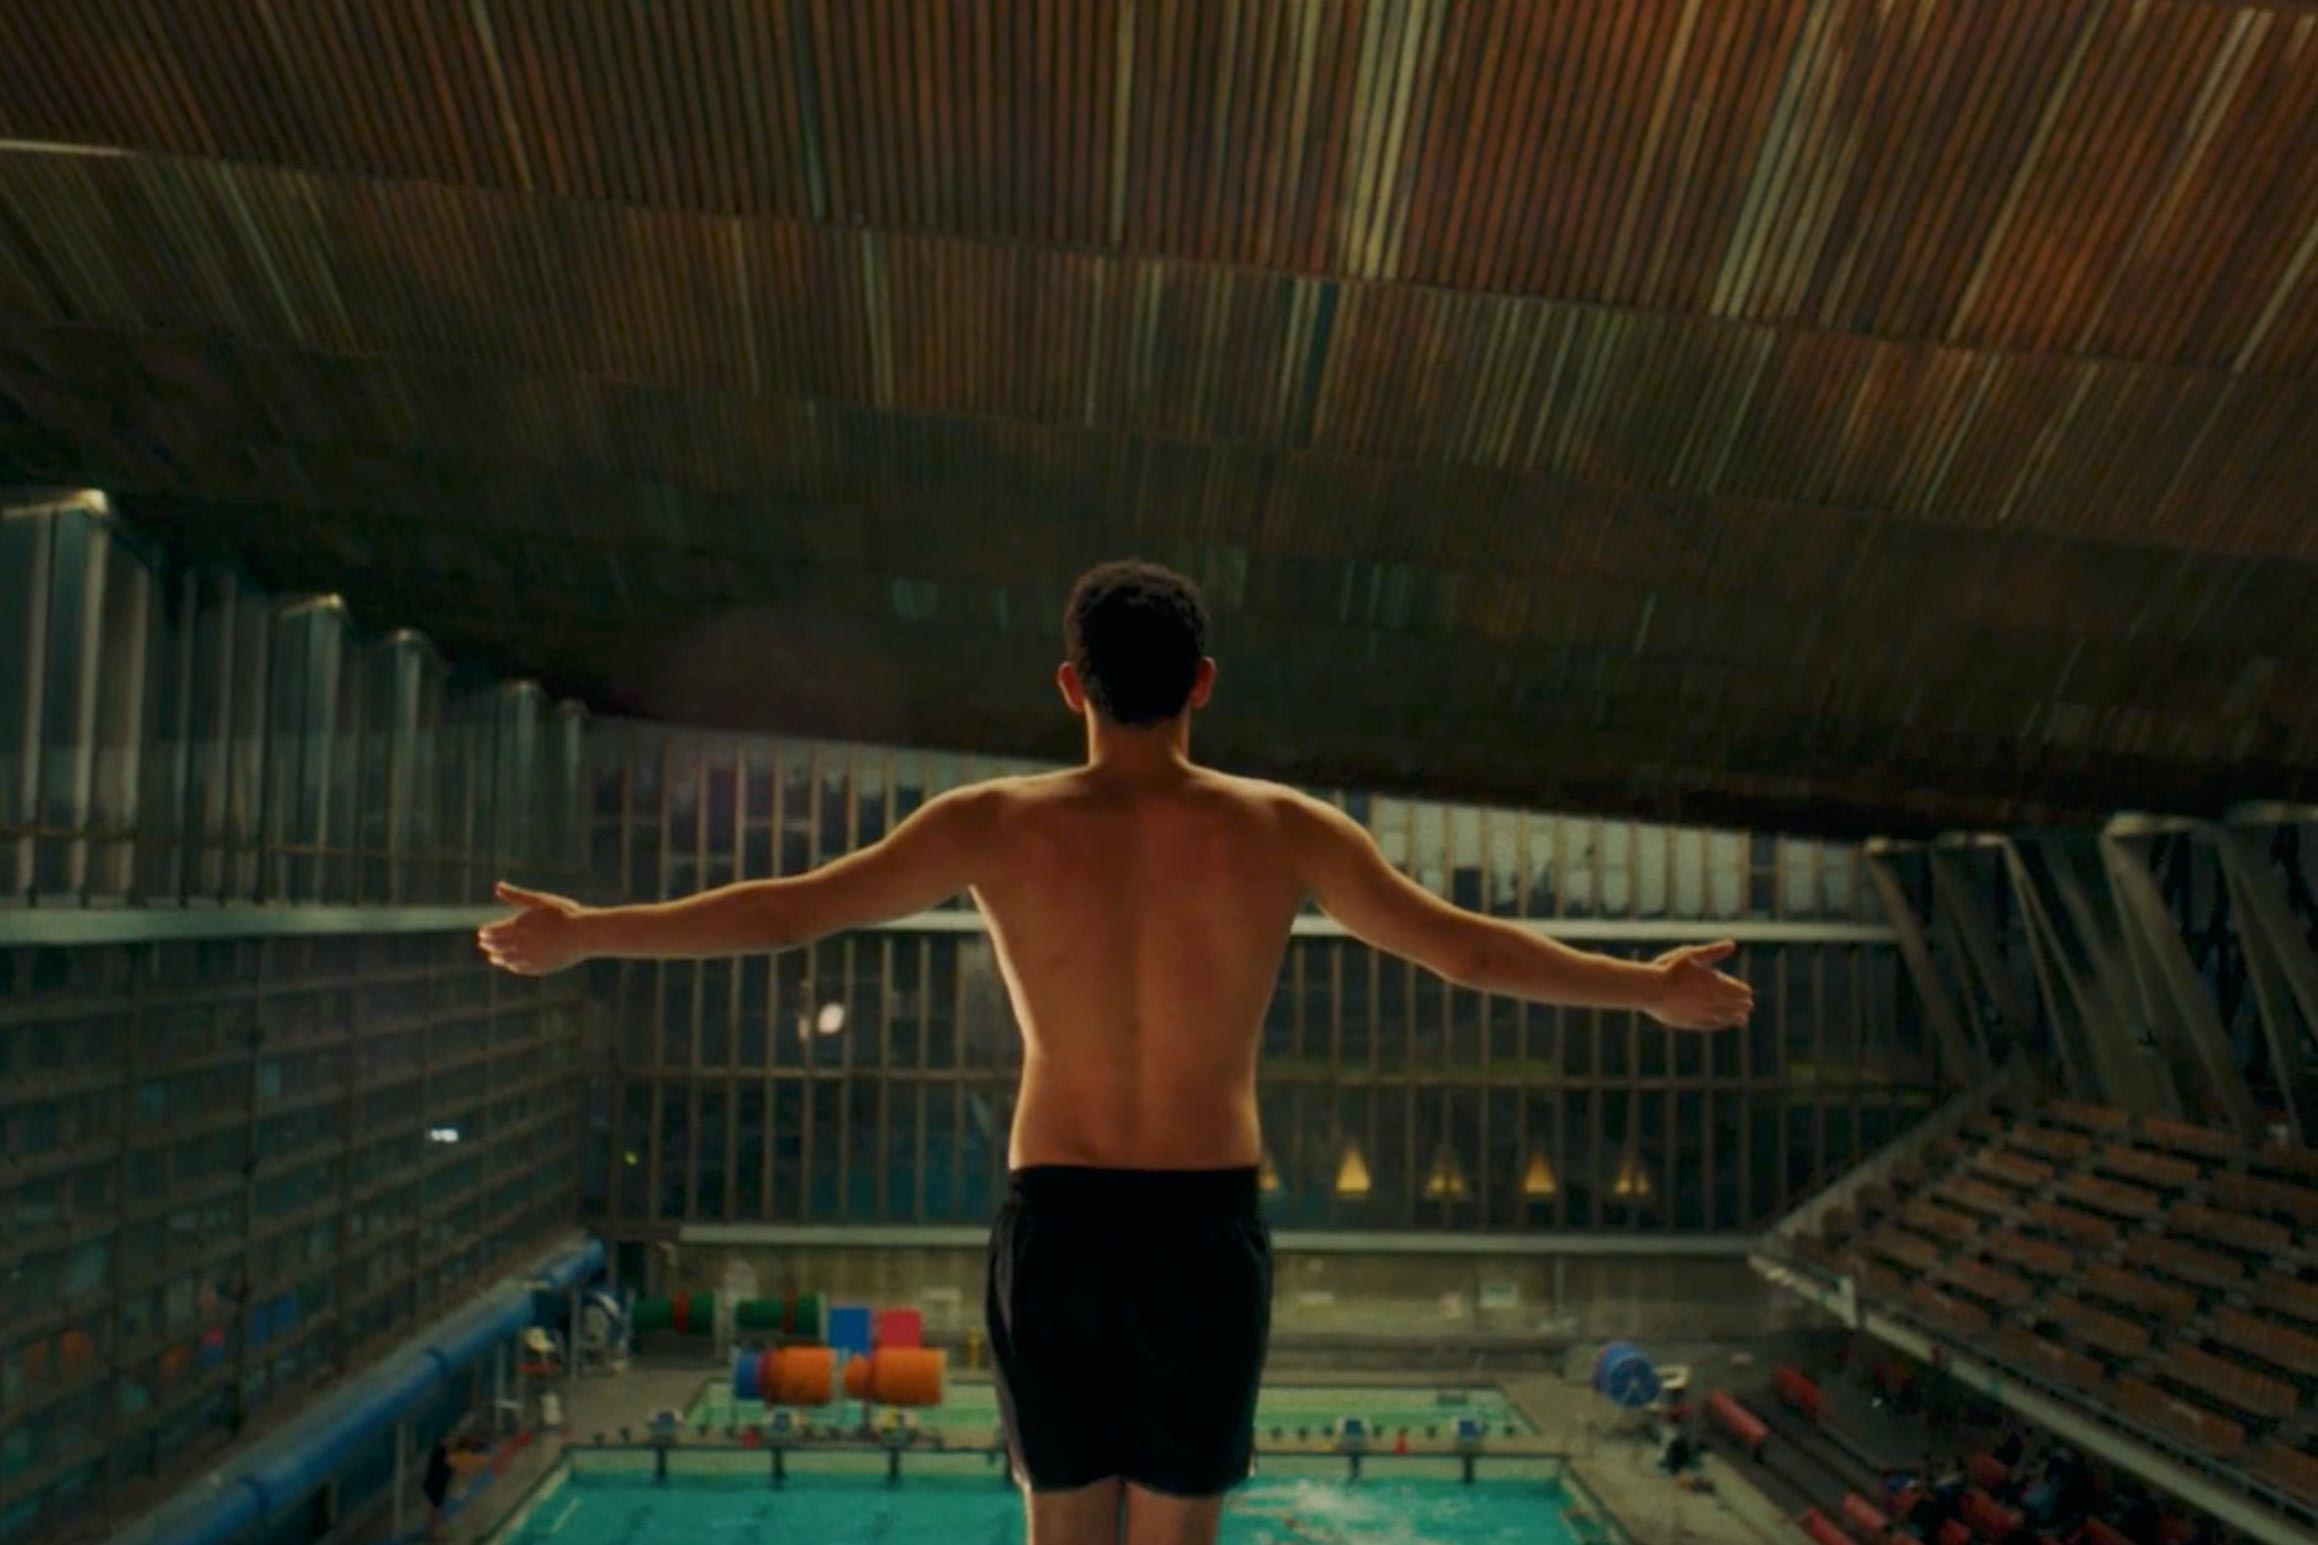 Nike documentary follows a teen who conquers self-doubt through sport